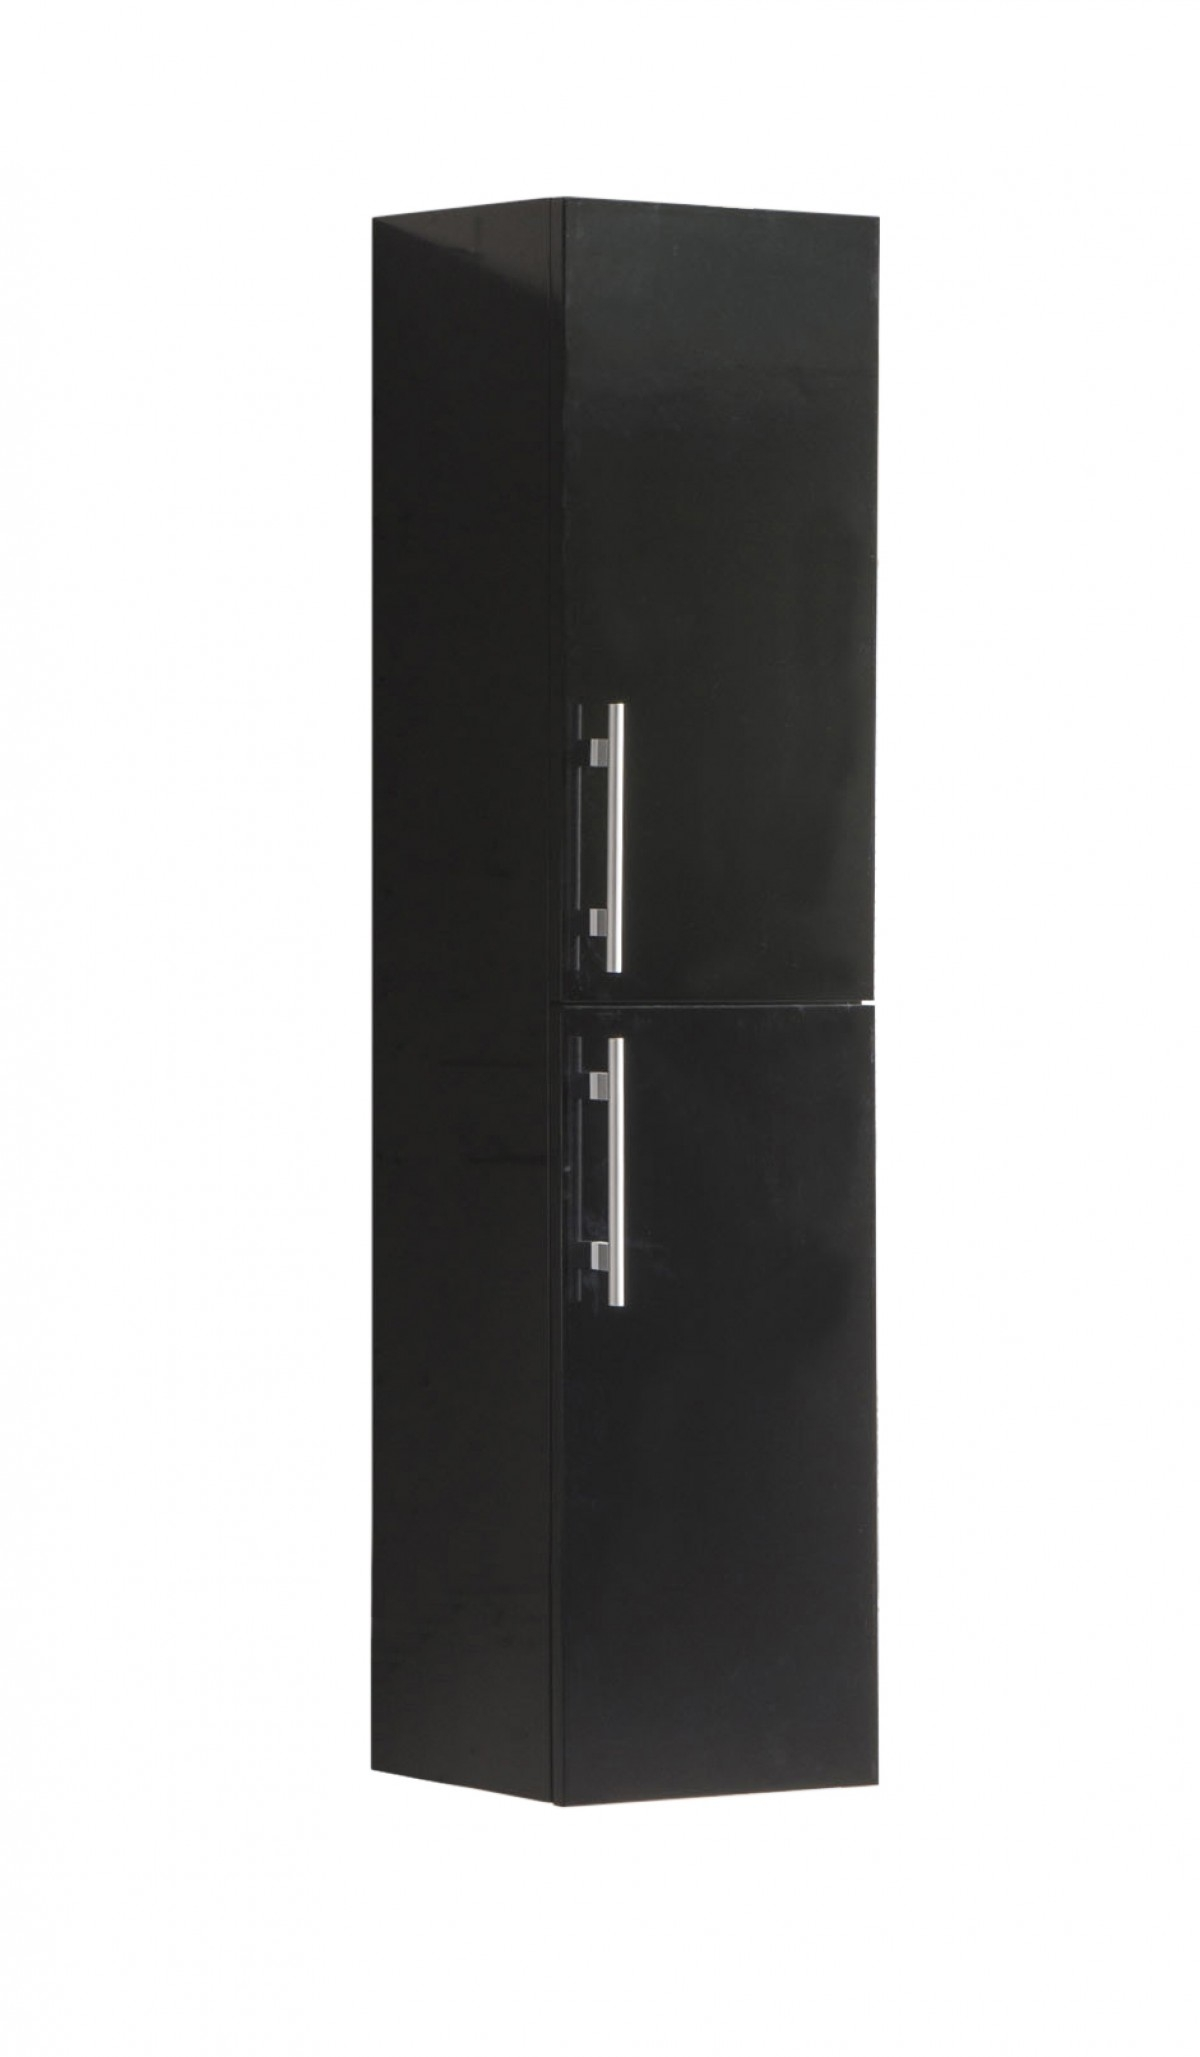 SaniGoods Giant kolomkast 120x30cm hoogglans zwart